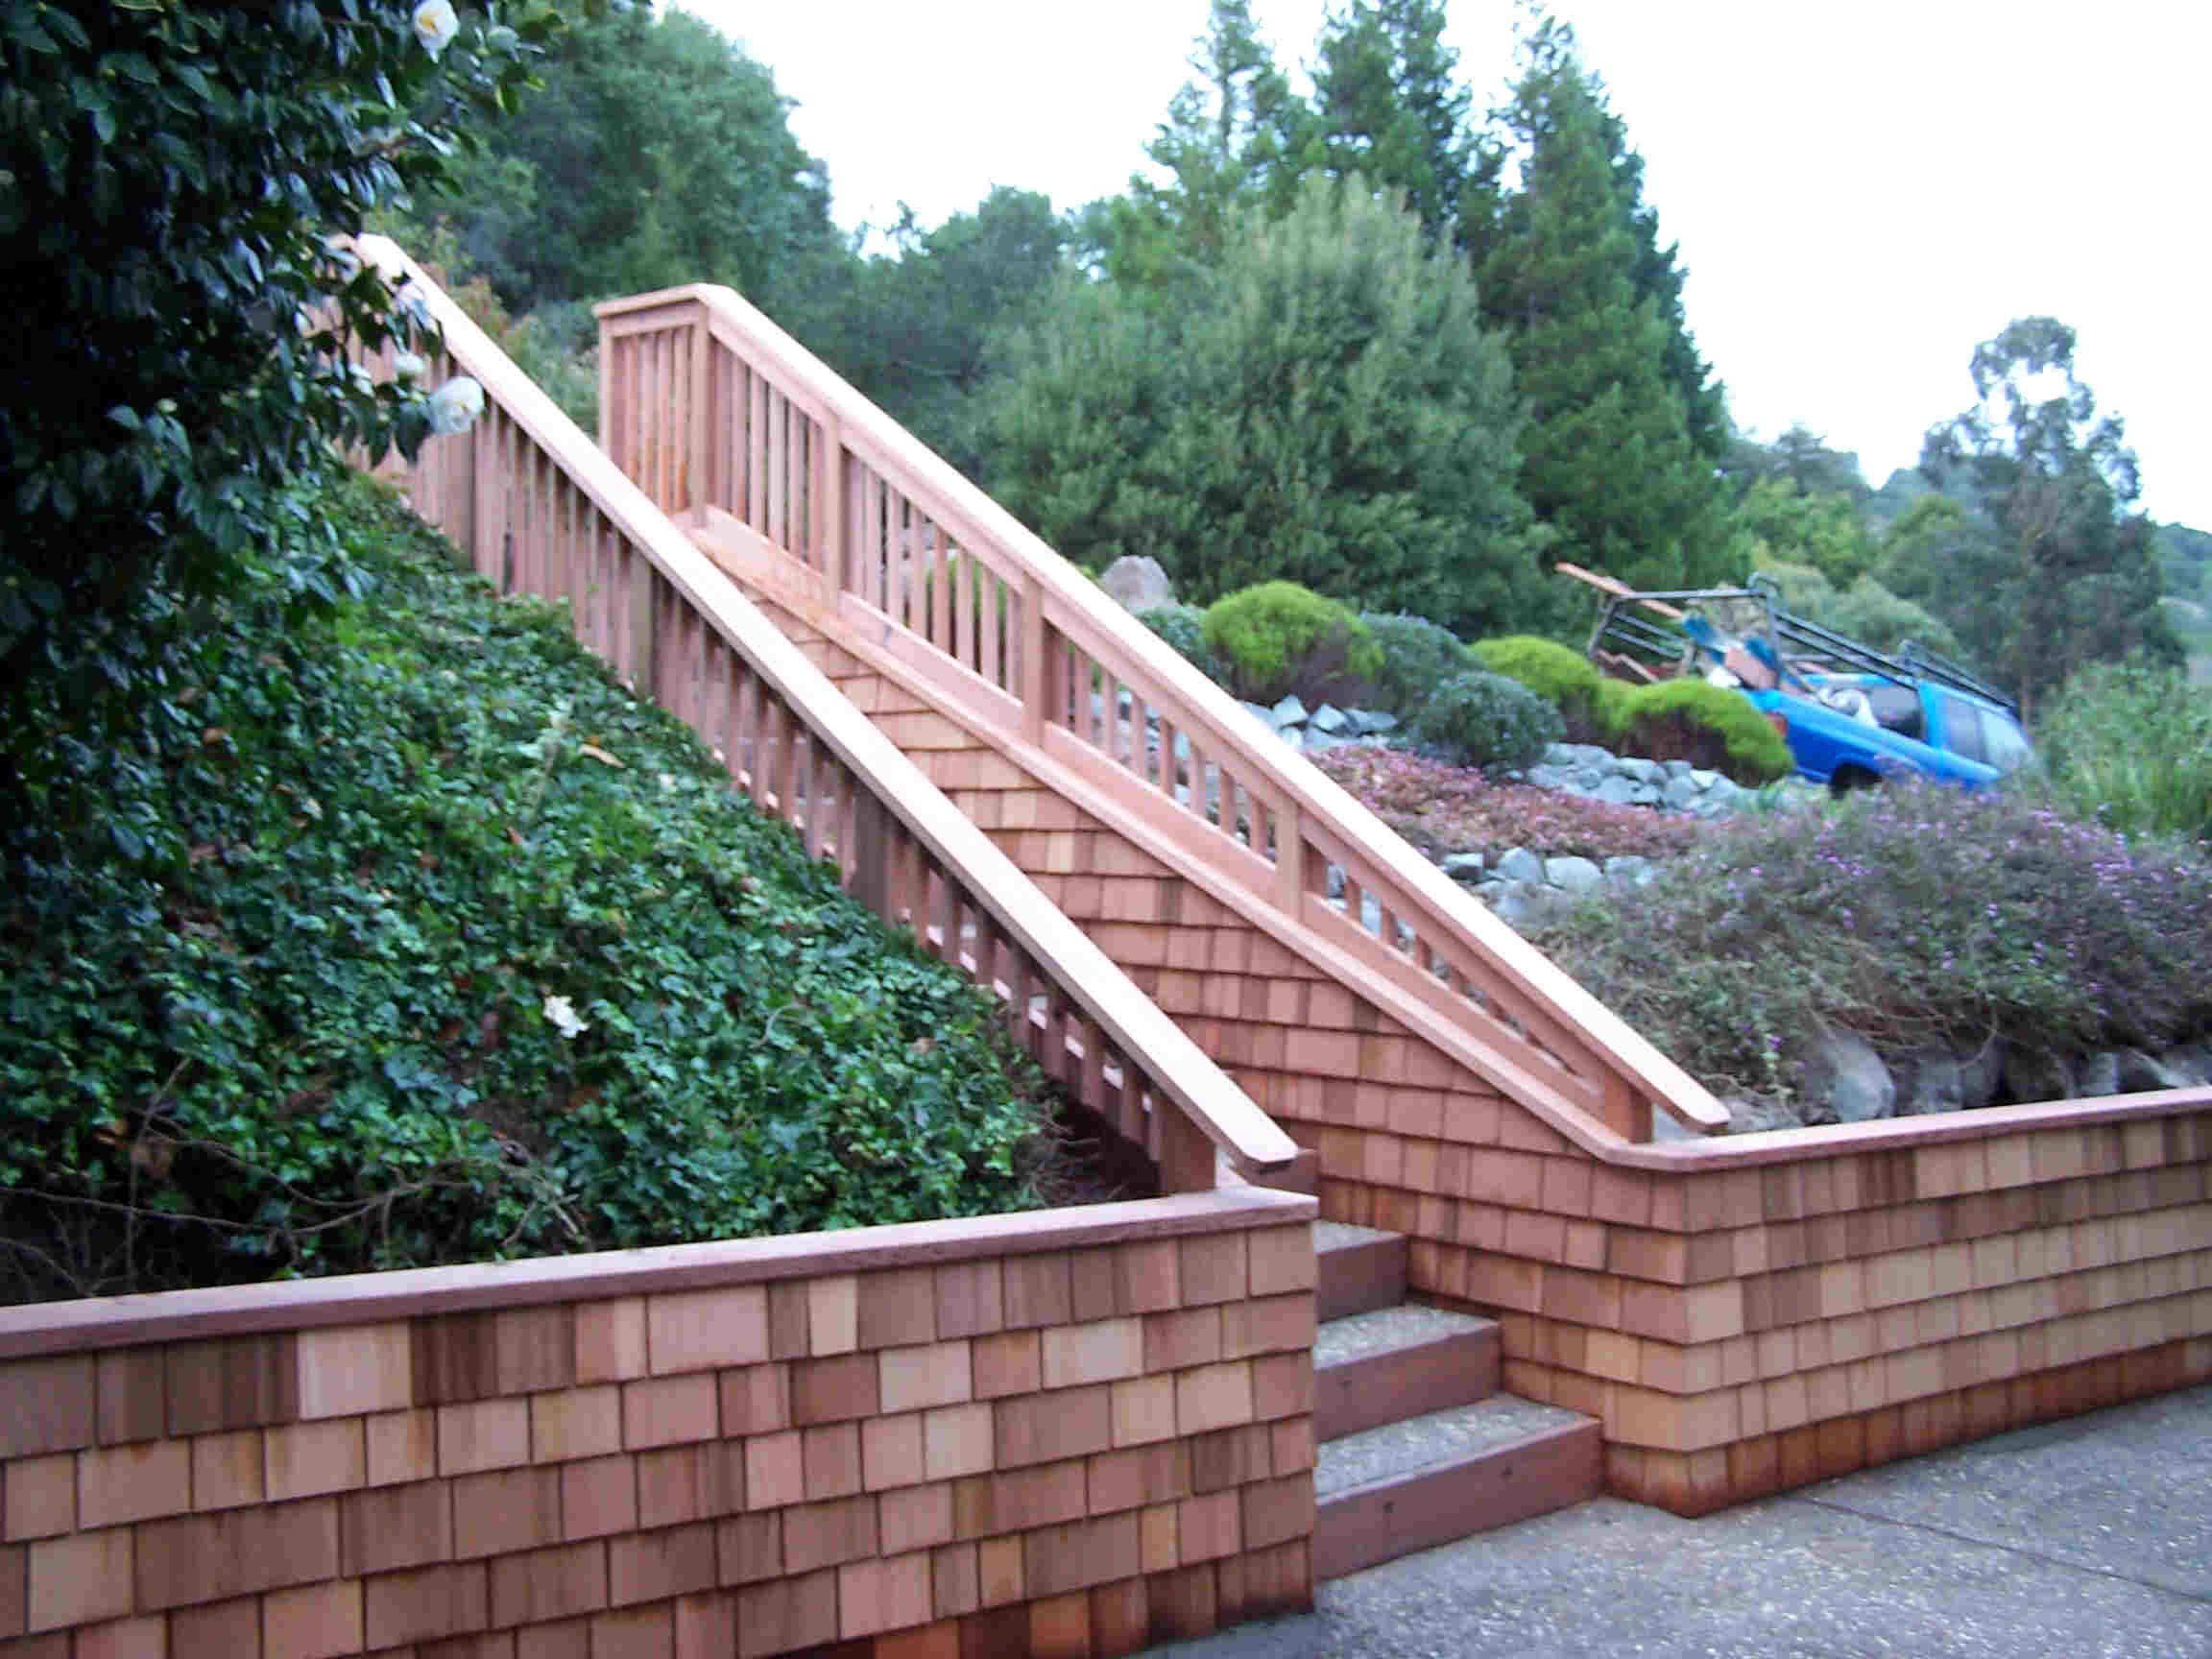 Shingle Retaining Wall W Stairs Garden Stairs Wood Retaining Wall Retaining Wall